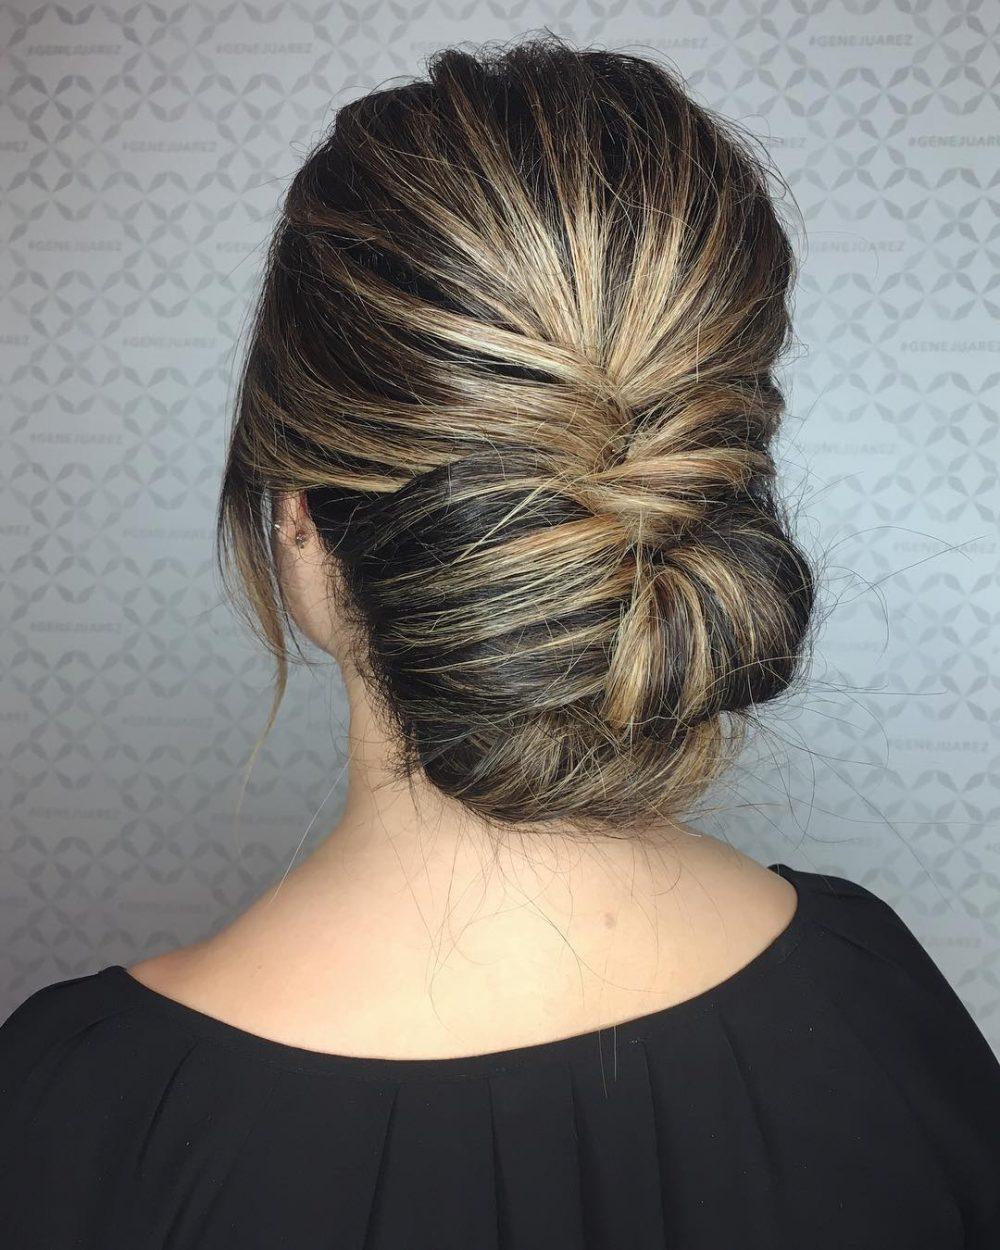 Polished Yet Playful hairstyle